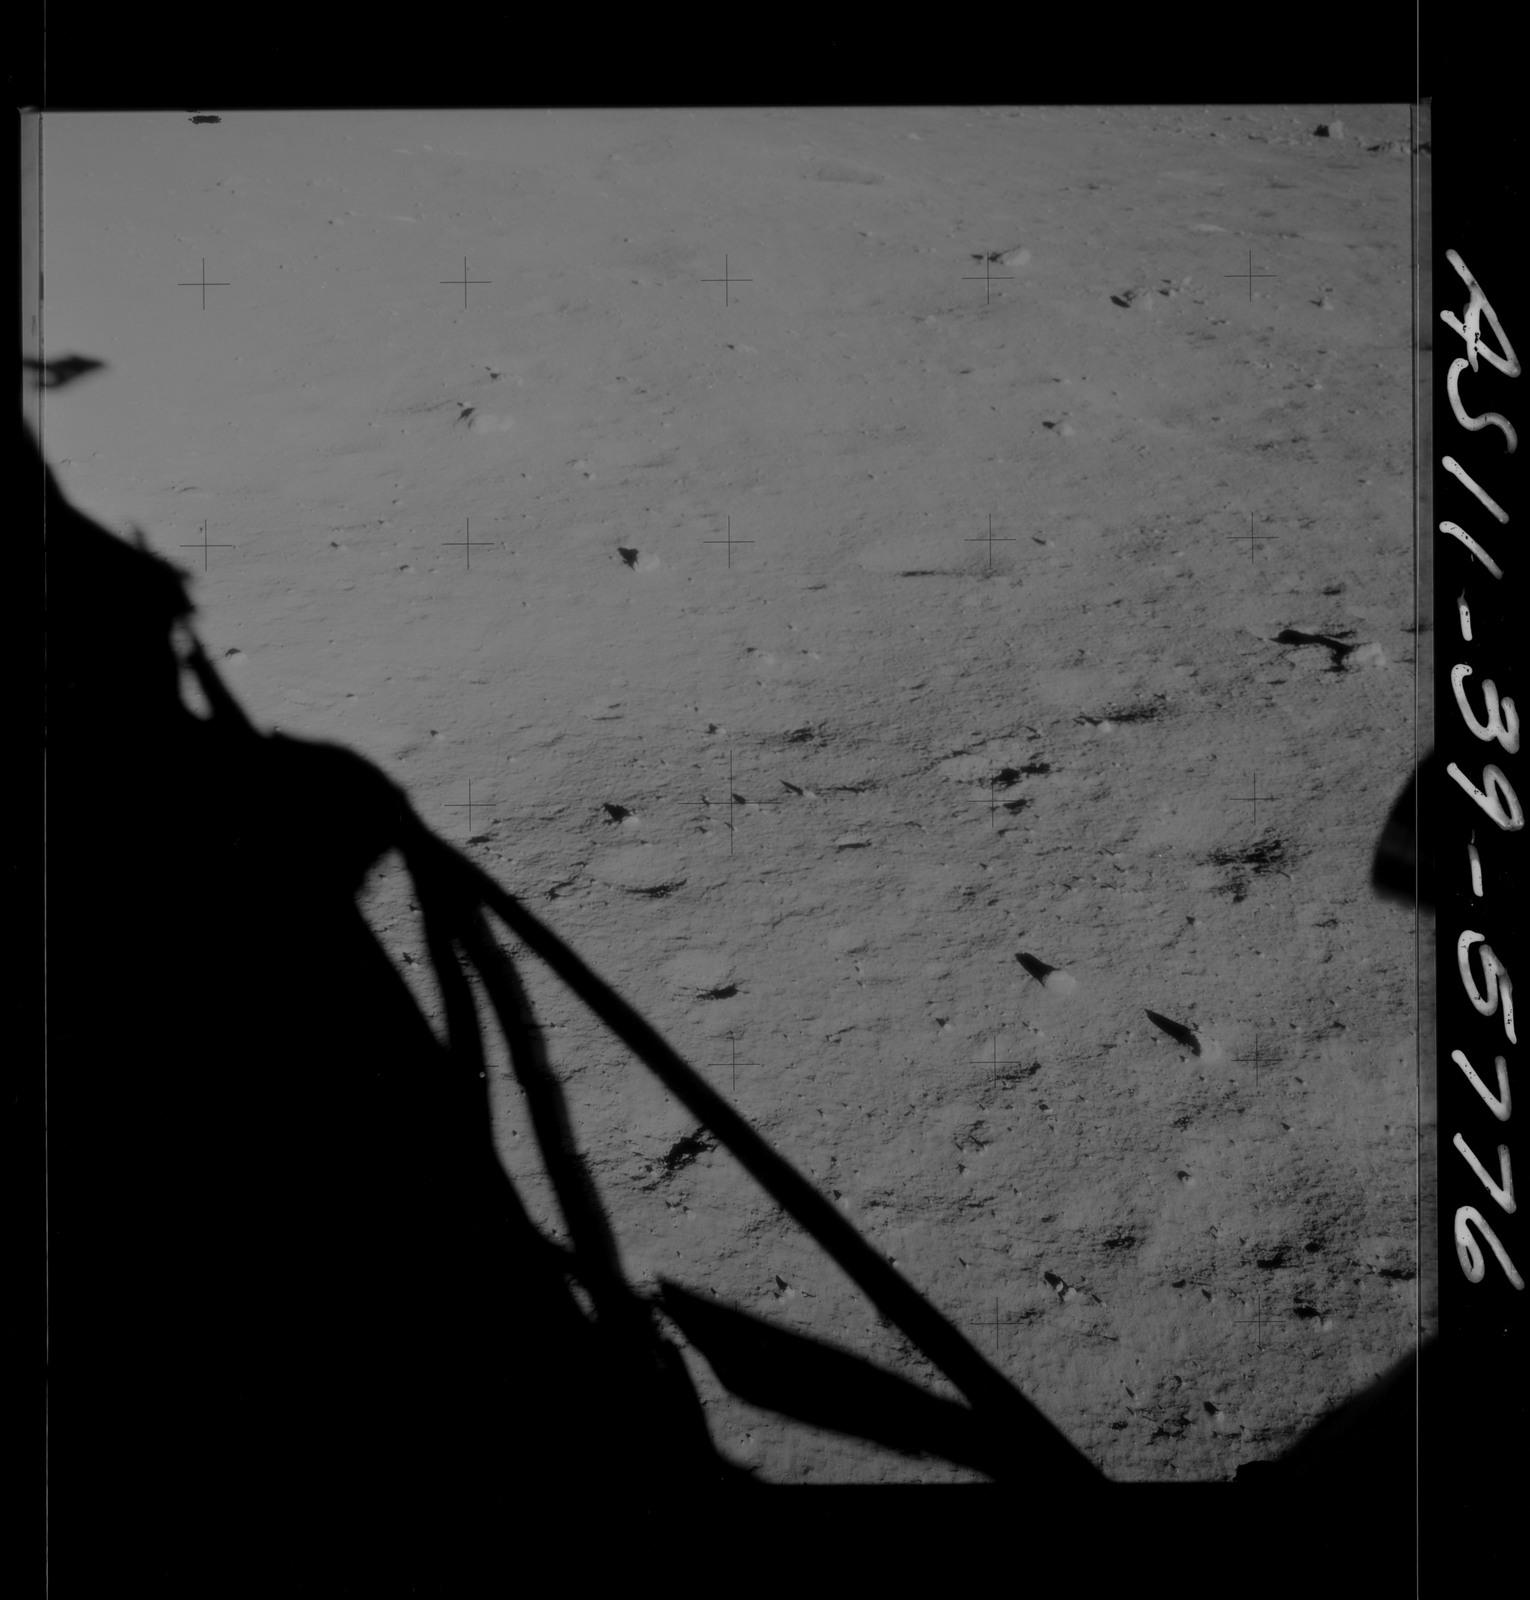 AS11-39-5776 - Apollo 11 - Apollo 11 Mission image - Shadow of Lunar Module on lunar surface